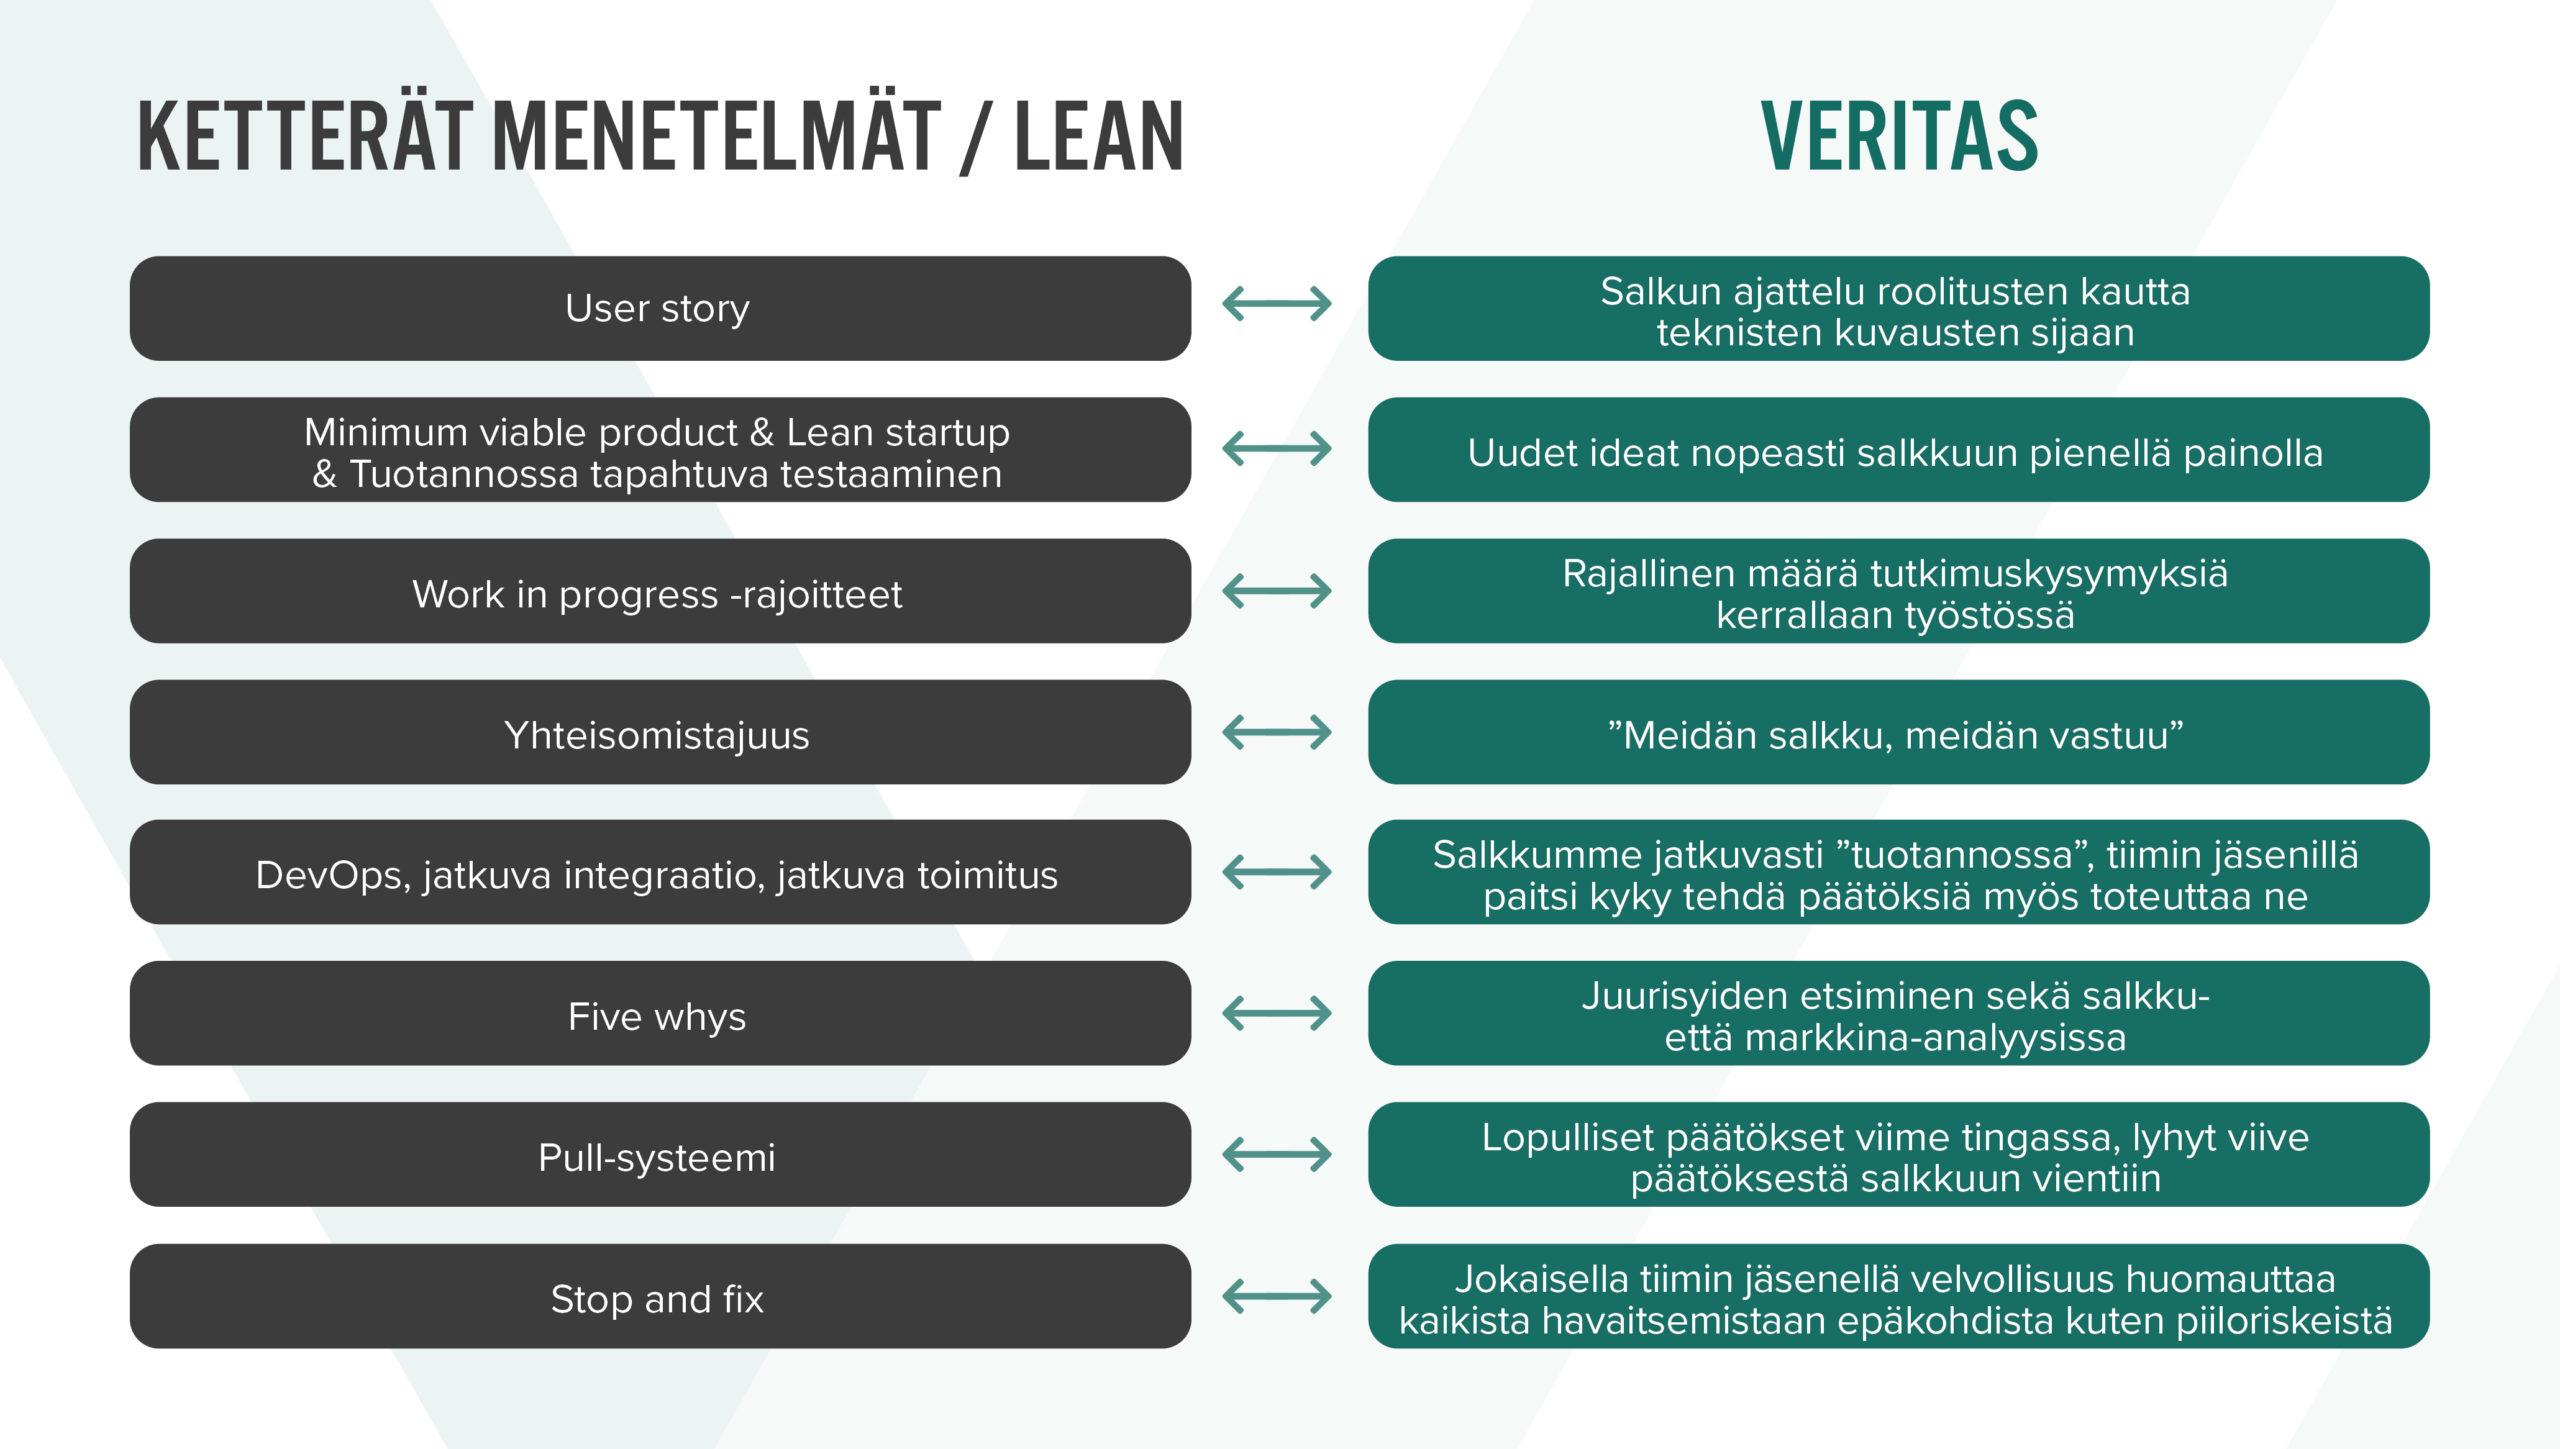 Ketterät menetelmät / lean vs. Veritas